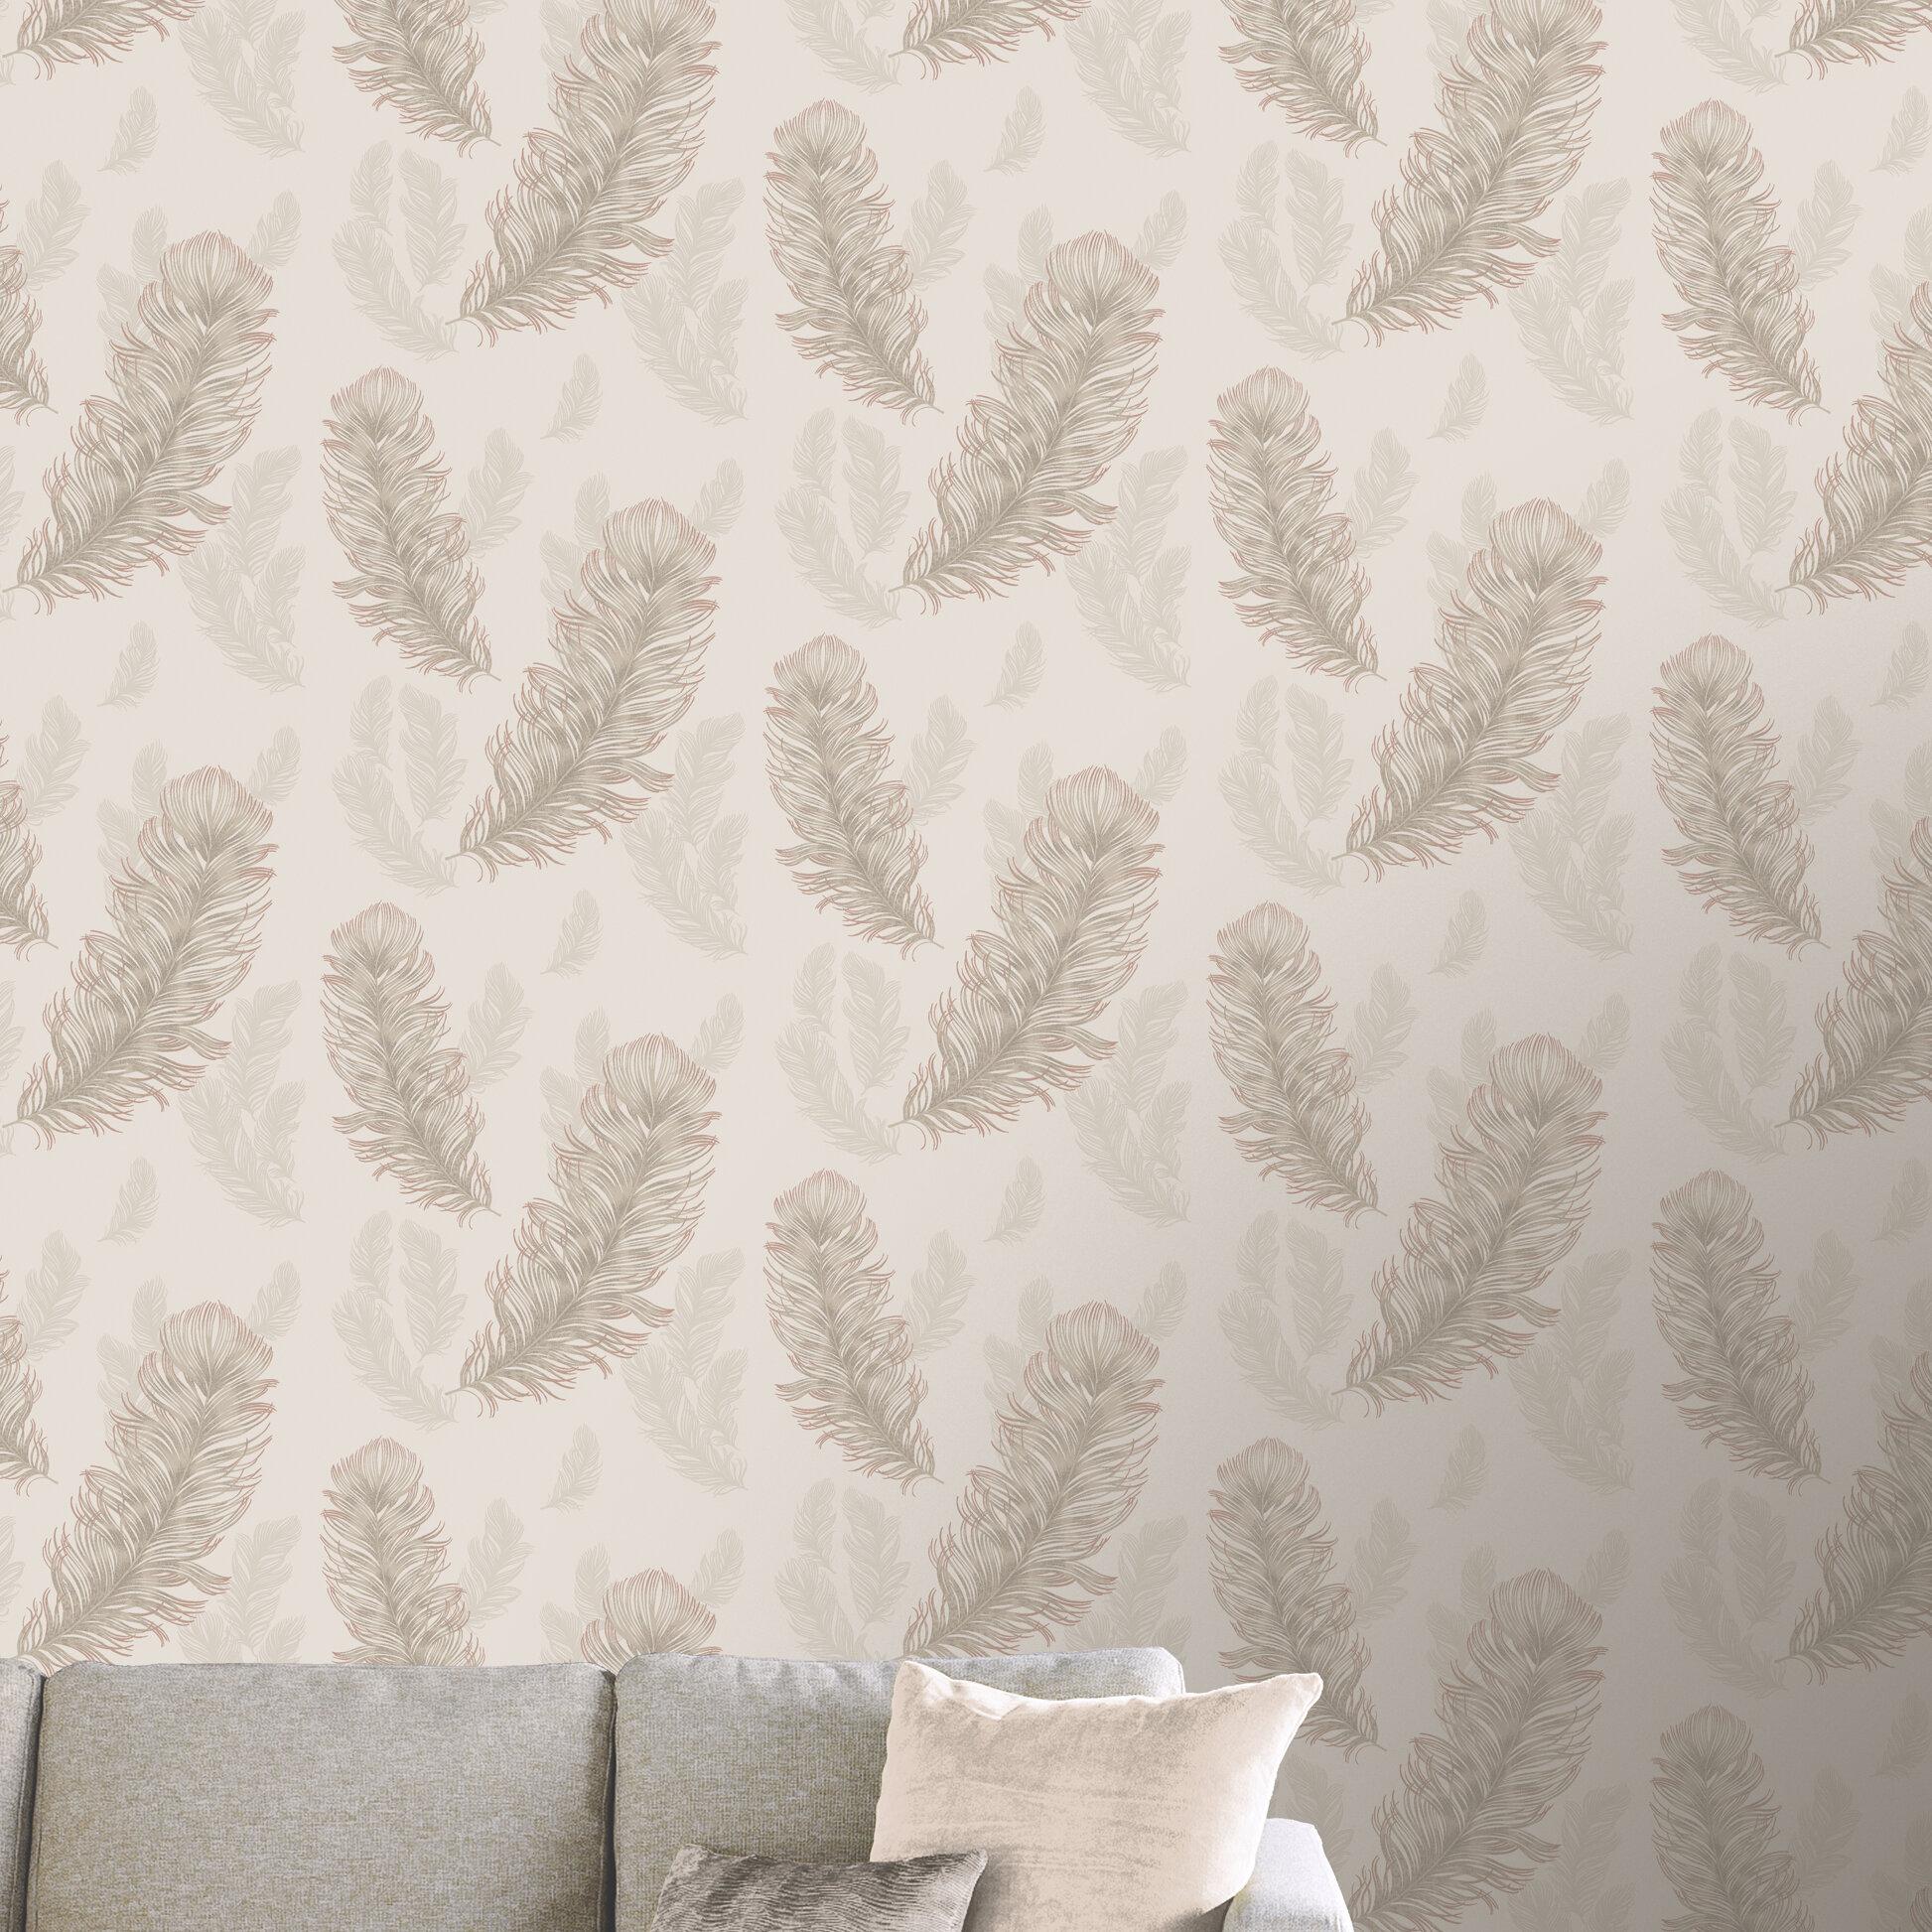 Arthouse Sirius Rose Gold 31 5 X 21 Wallpaper Roll Wayfair